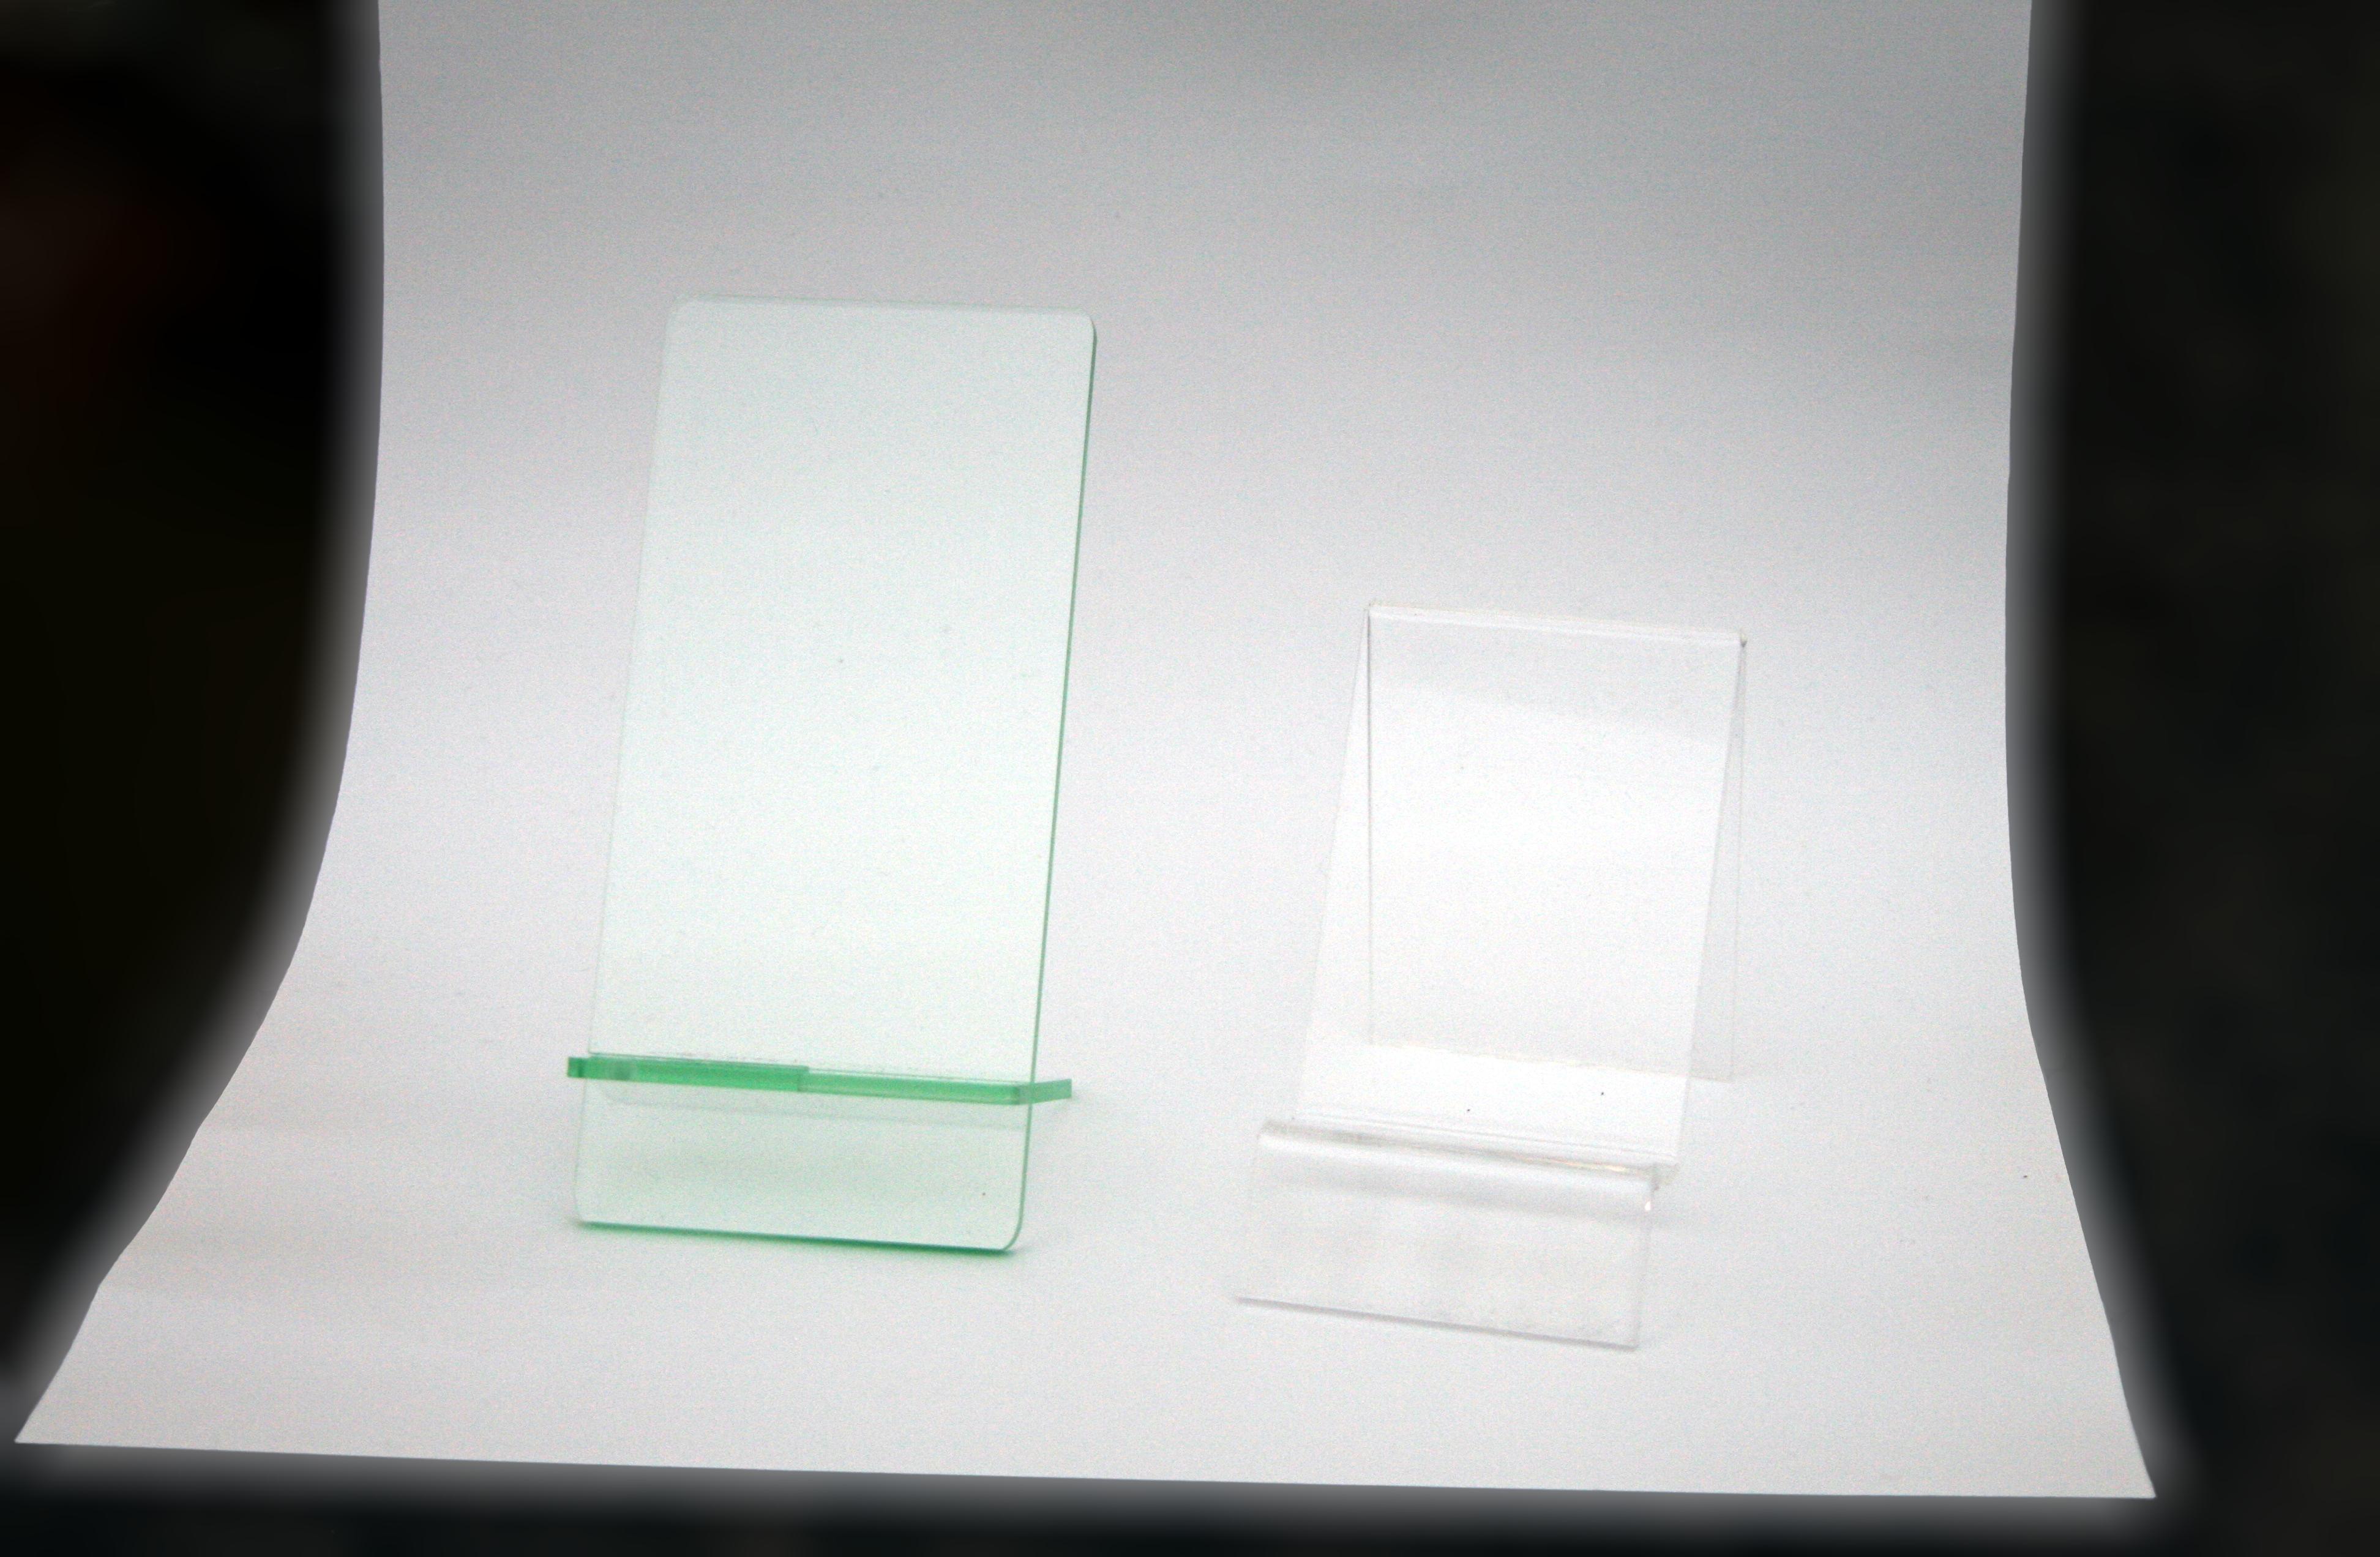 Rigid Transparent Plastics Market 2021: Key Things to Know (Vendors, Regions, Revenue, Shares, Size)